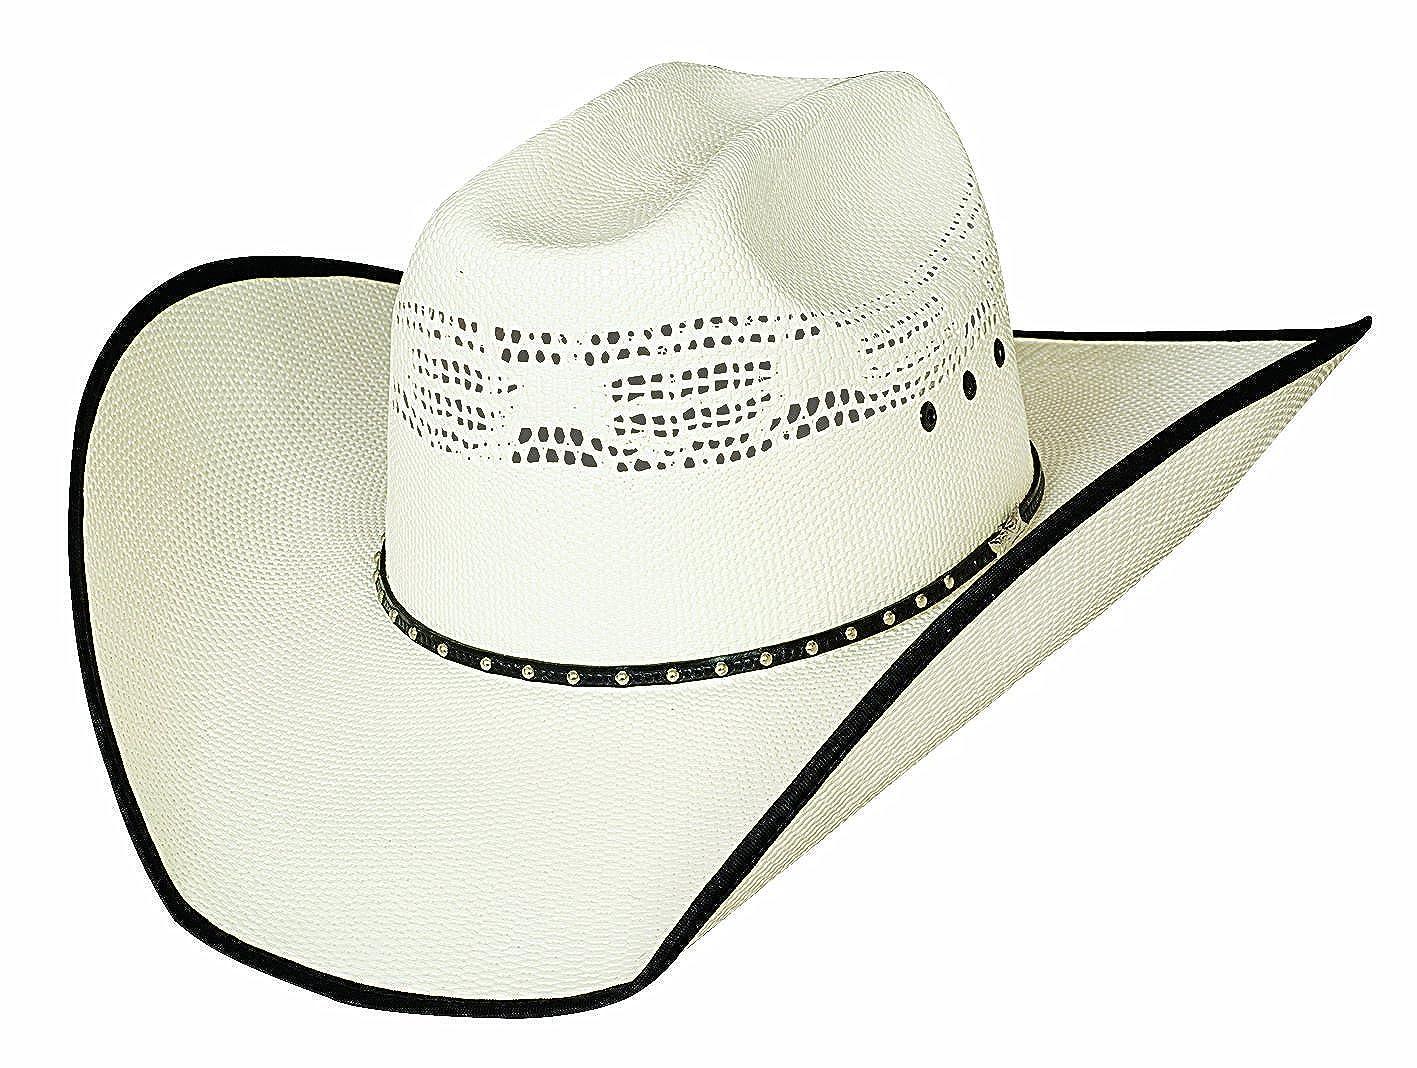 6 7//8 Justin Moore Montecarlo Bullhide Hats Beer Time Western 20X Bangora Straw Cowboy Hat